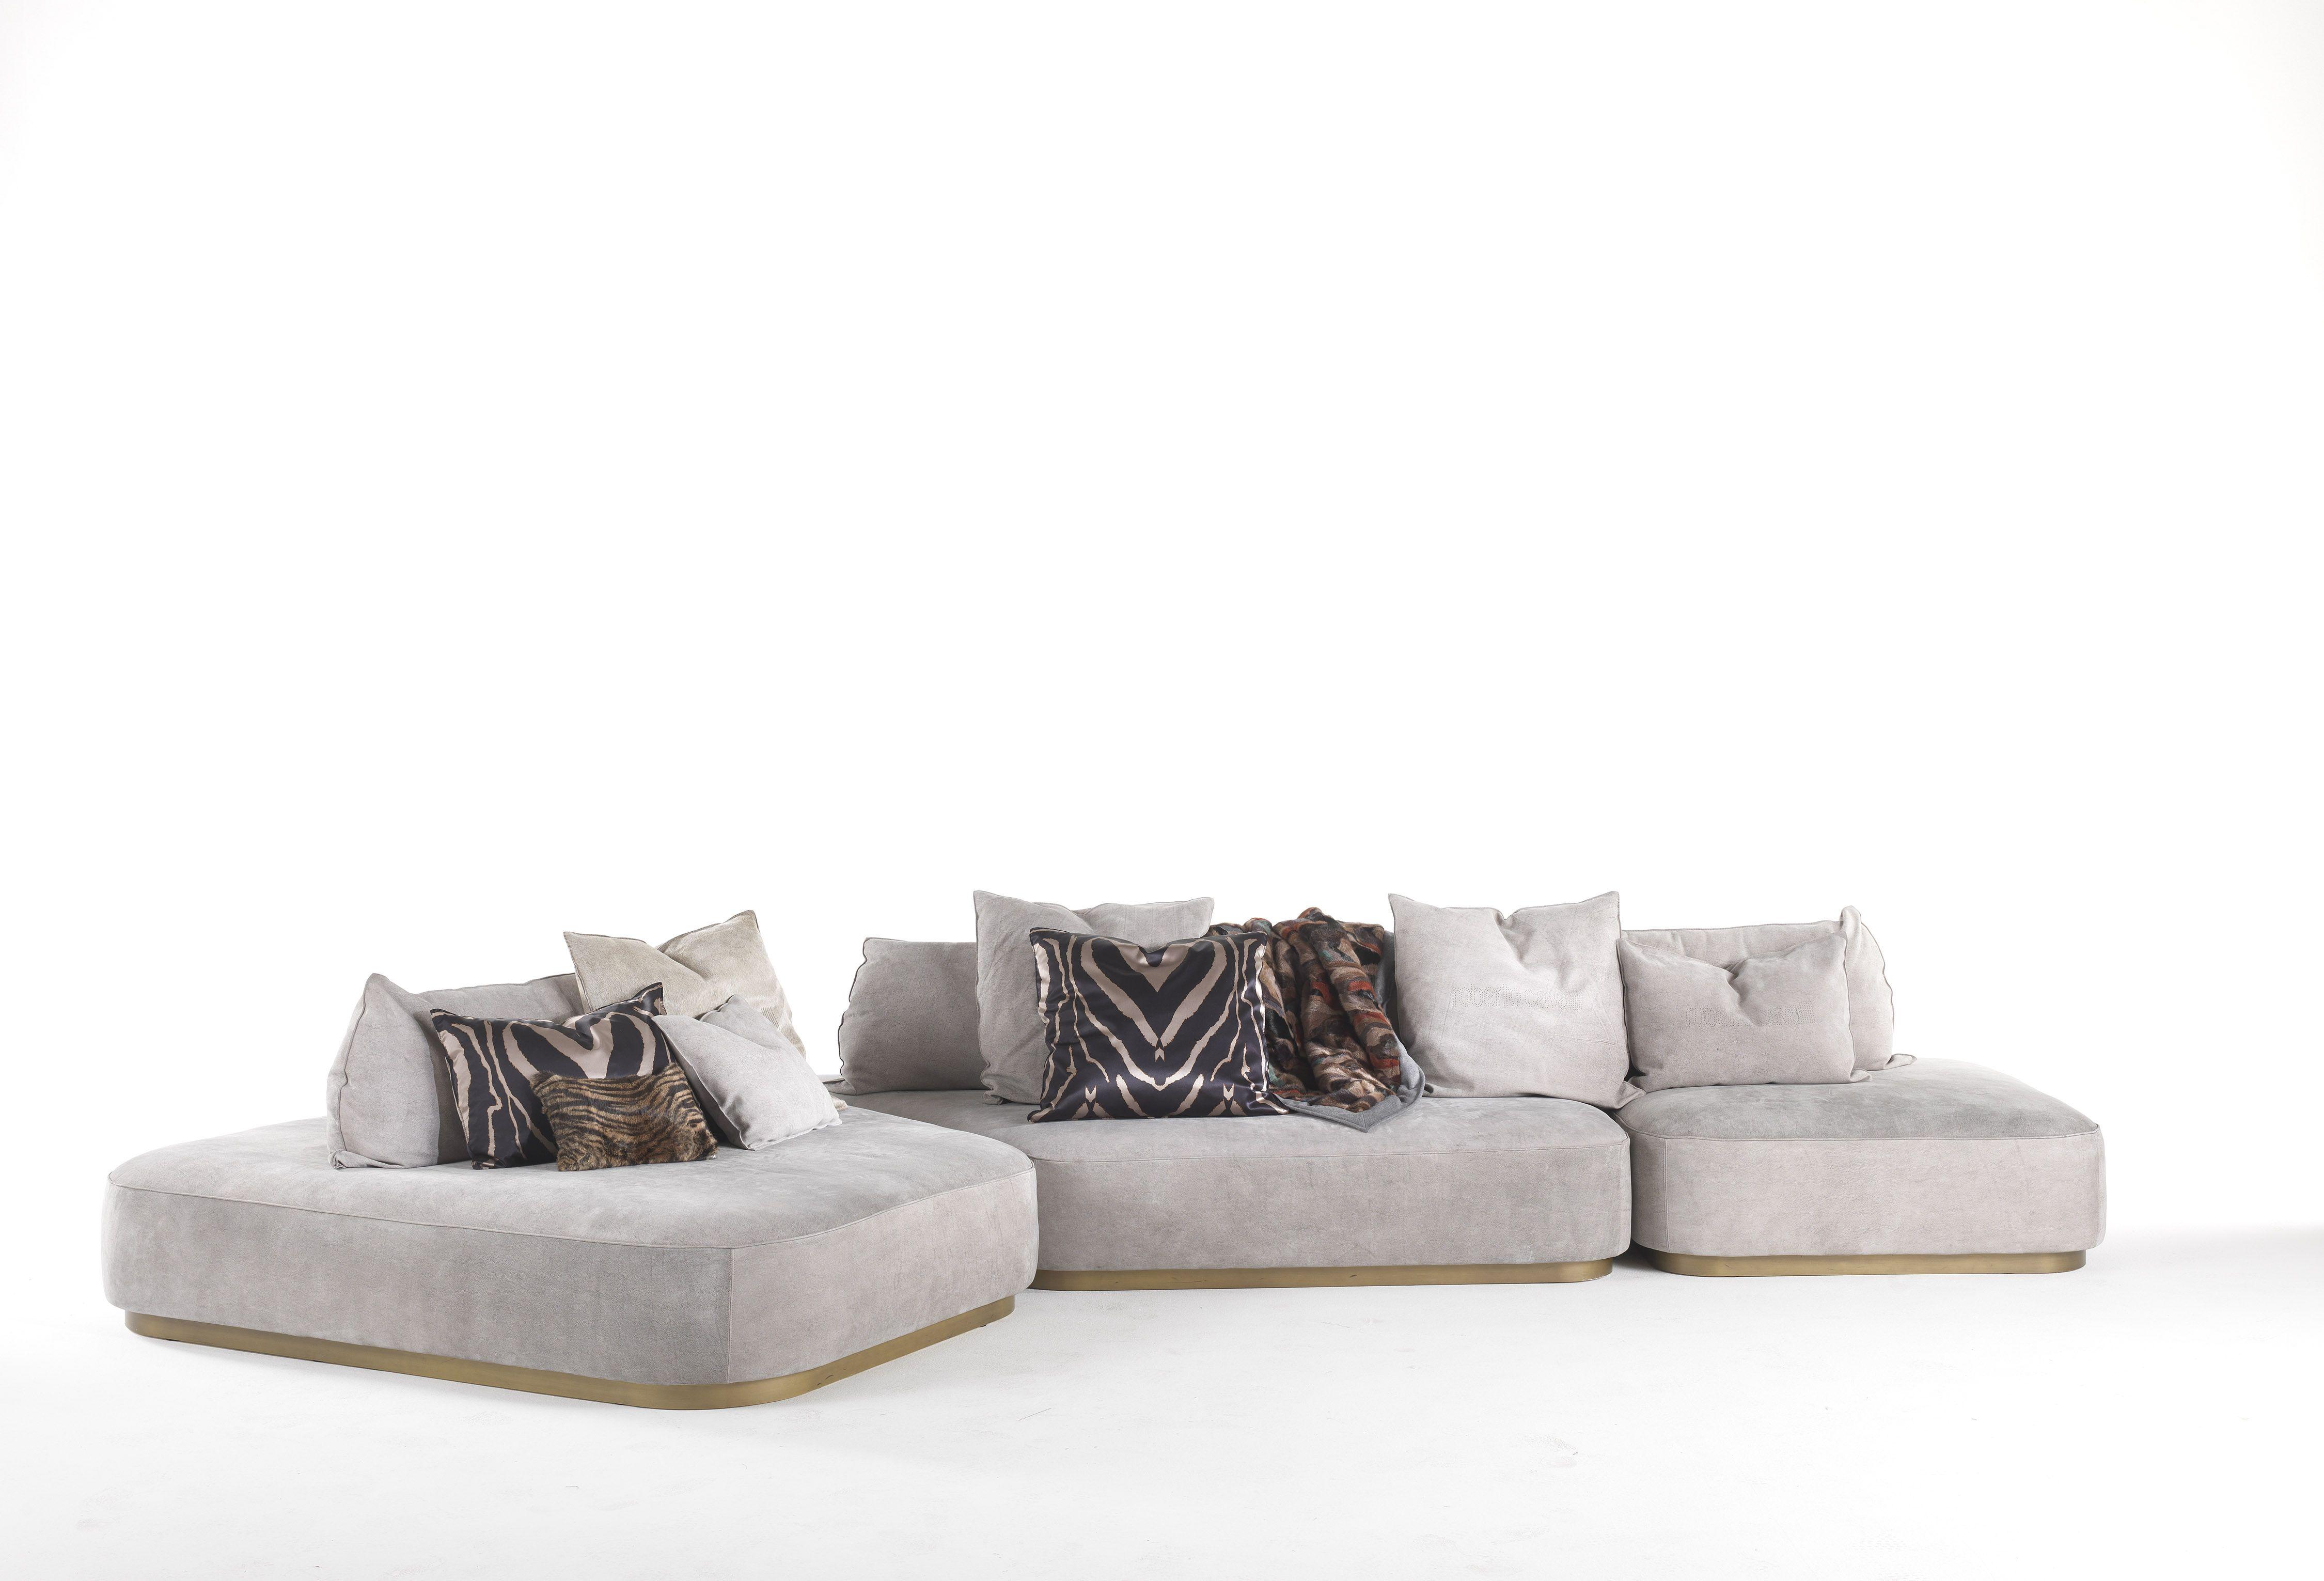 Modular Living Room Furniture Uk Hamptons Modular Sofa Roberto Cavalli Home